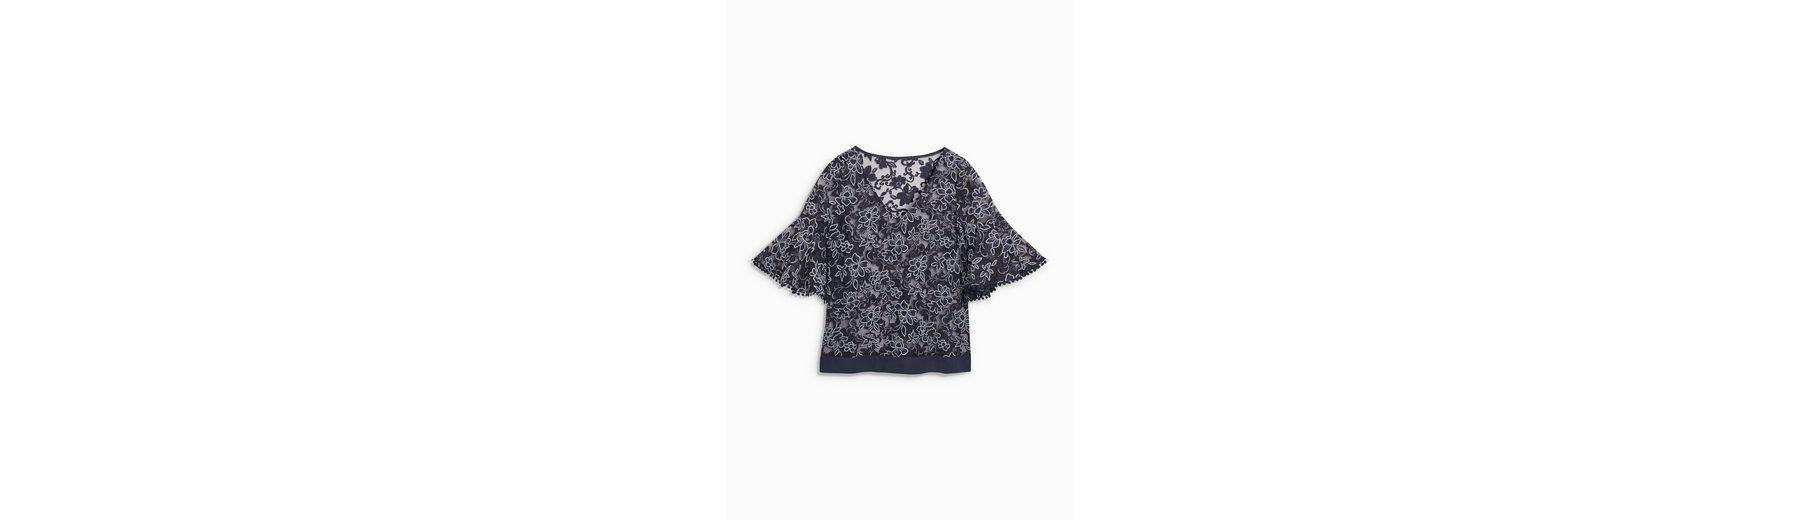 Next T-Shirt mit Ausbrennermuster 2018 Billig Verkaufen Gut Verkaufen Zu Verkaufen 0DGiR9T